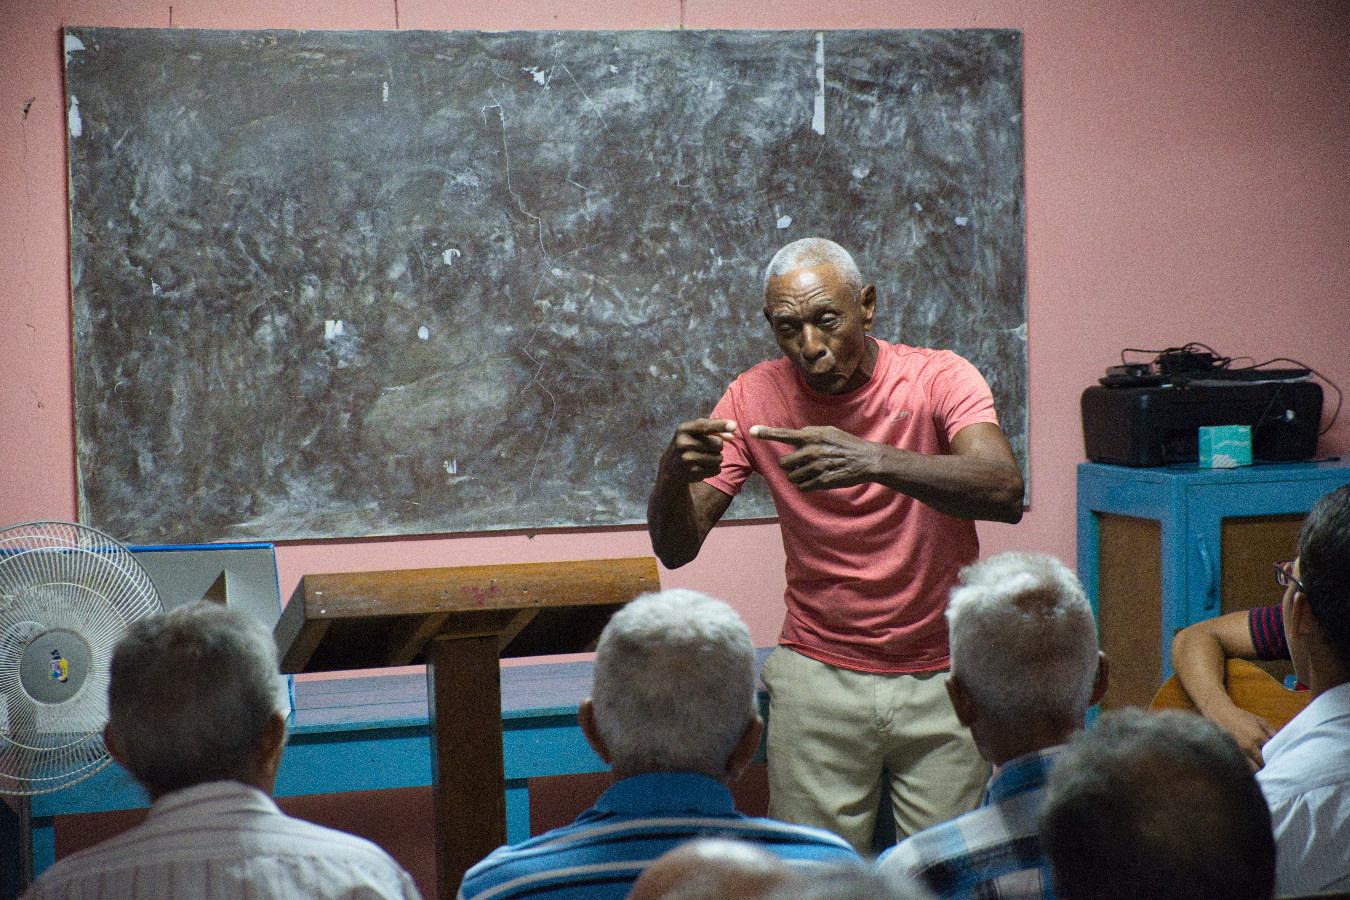 Manuel sharing his testimony